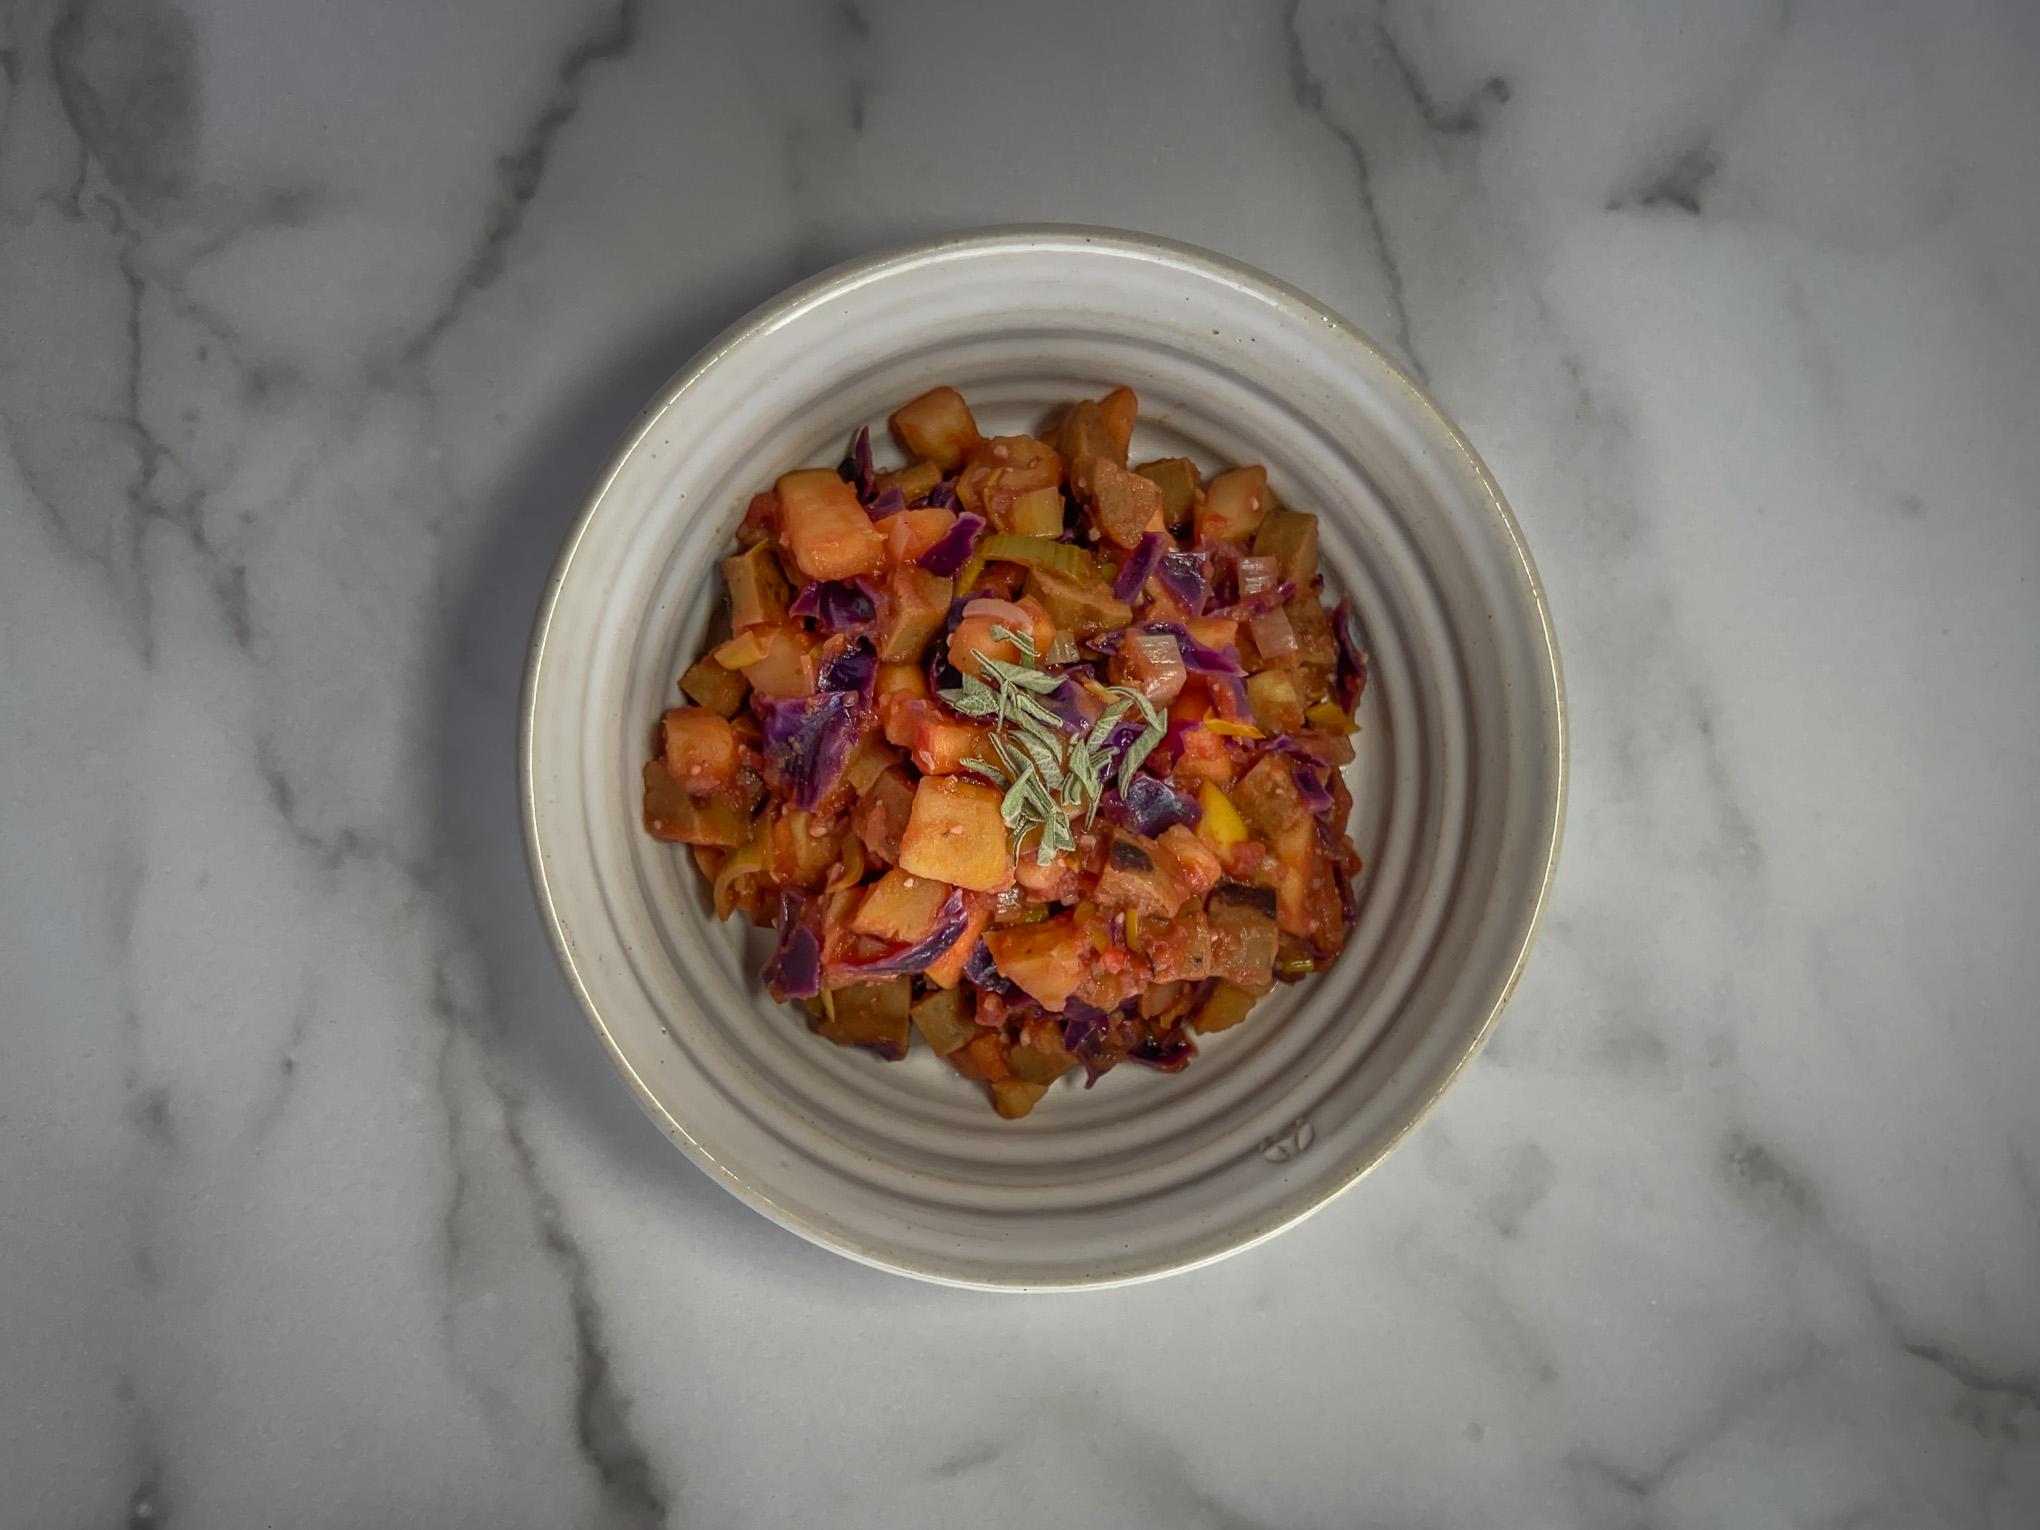 Bowl of vegetarian sausage and veggies